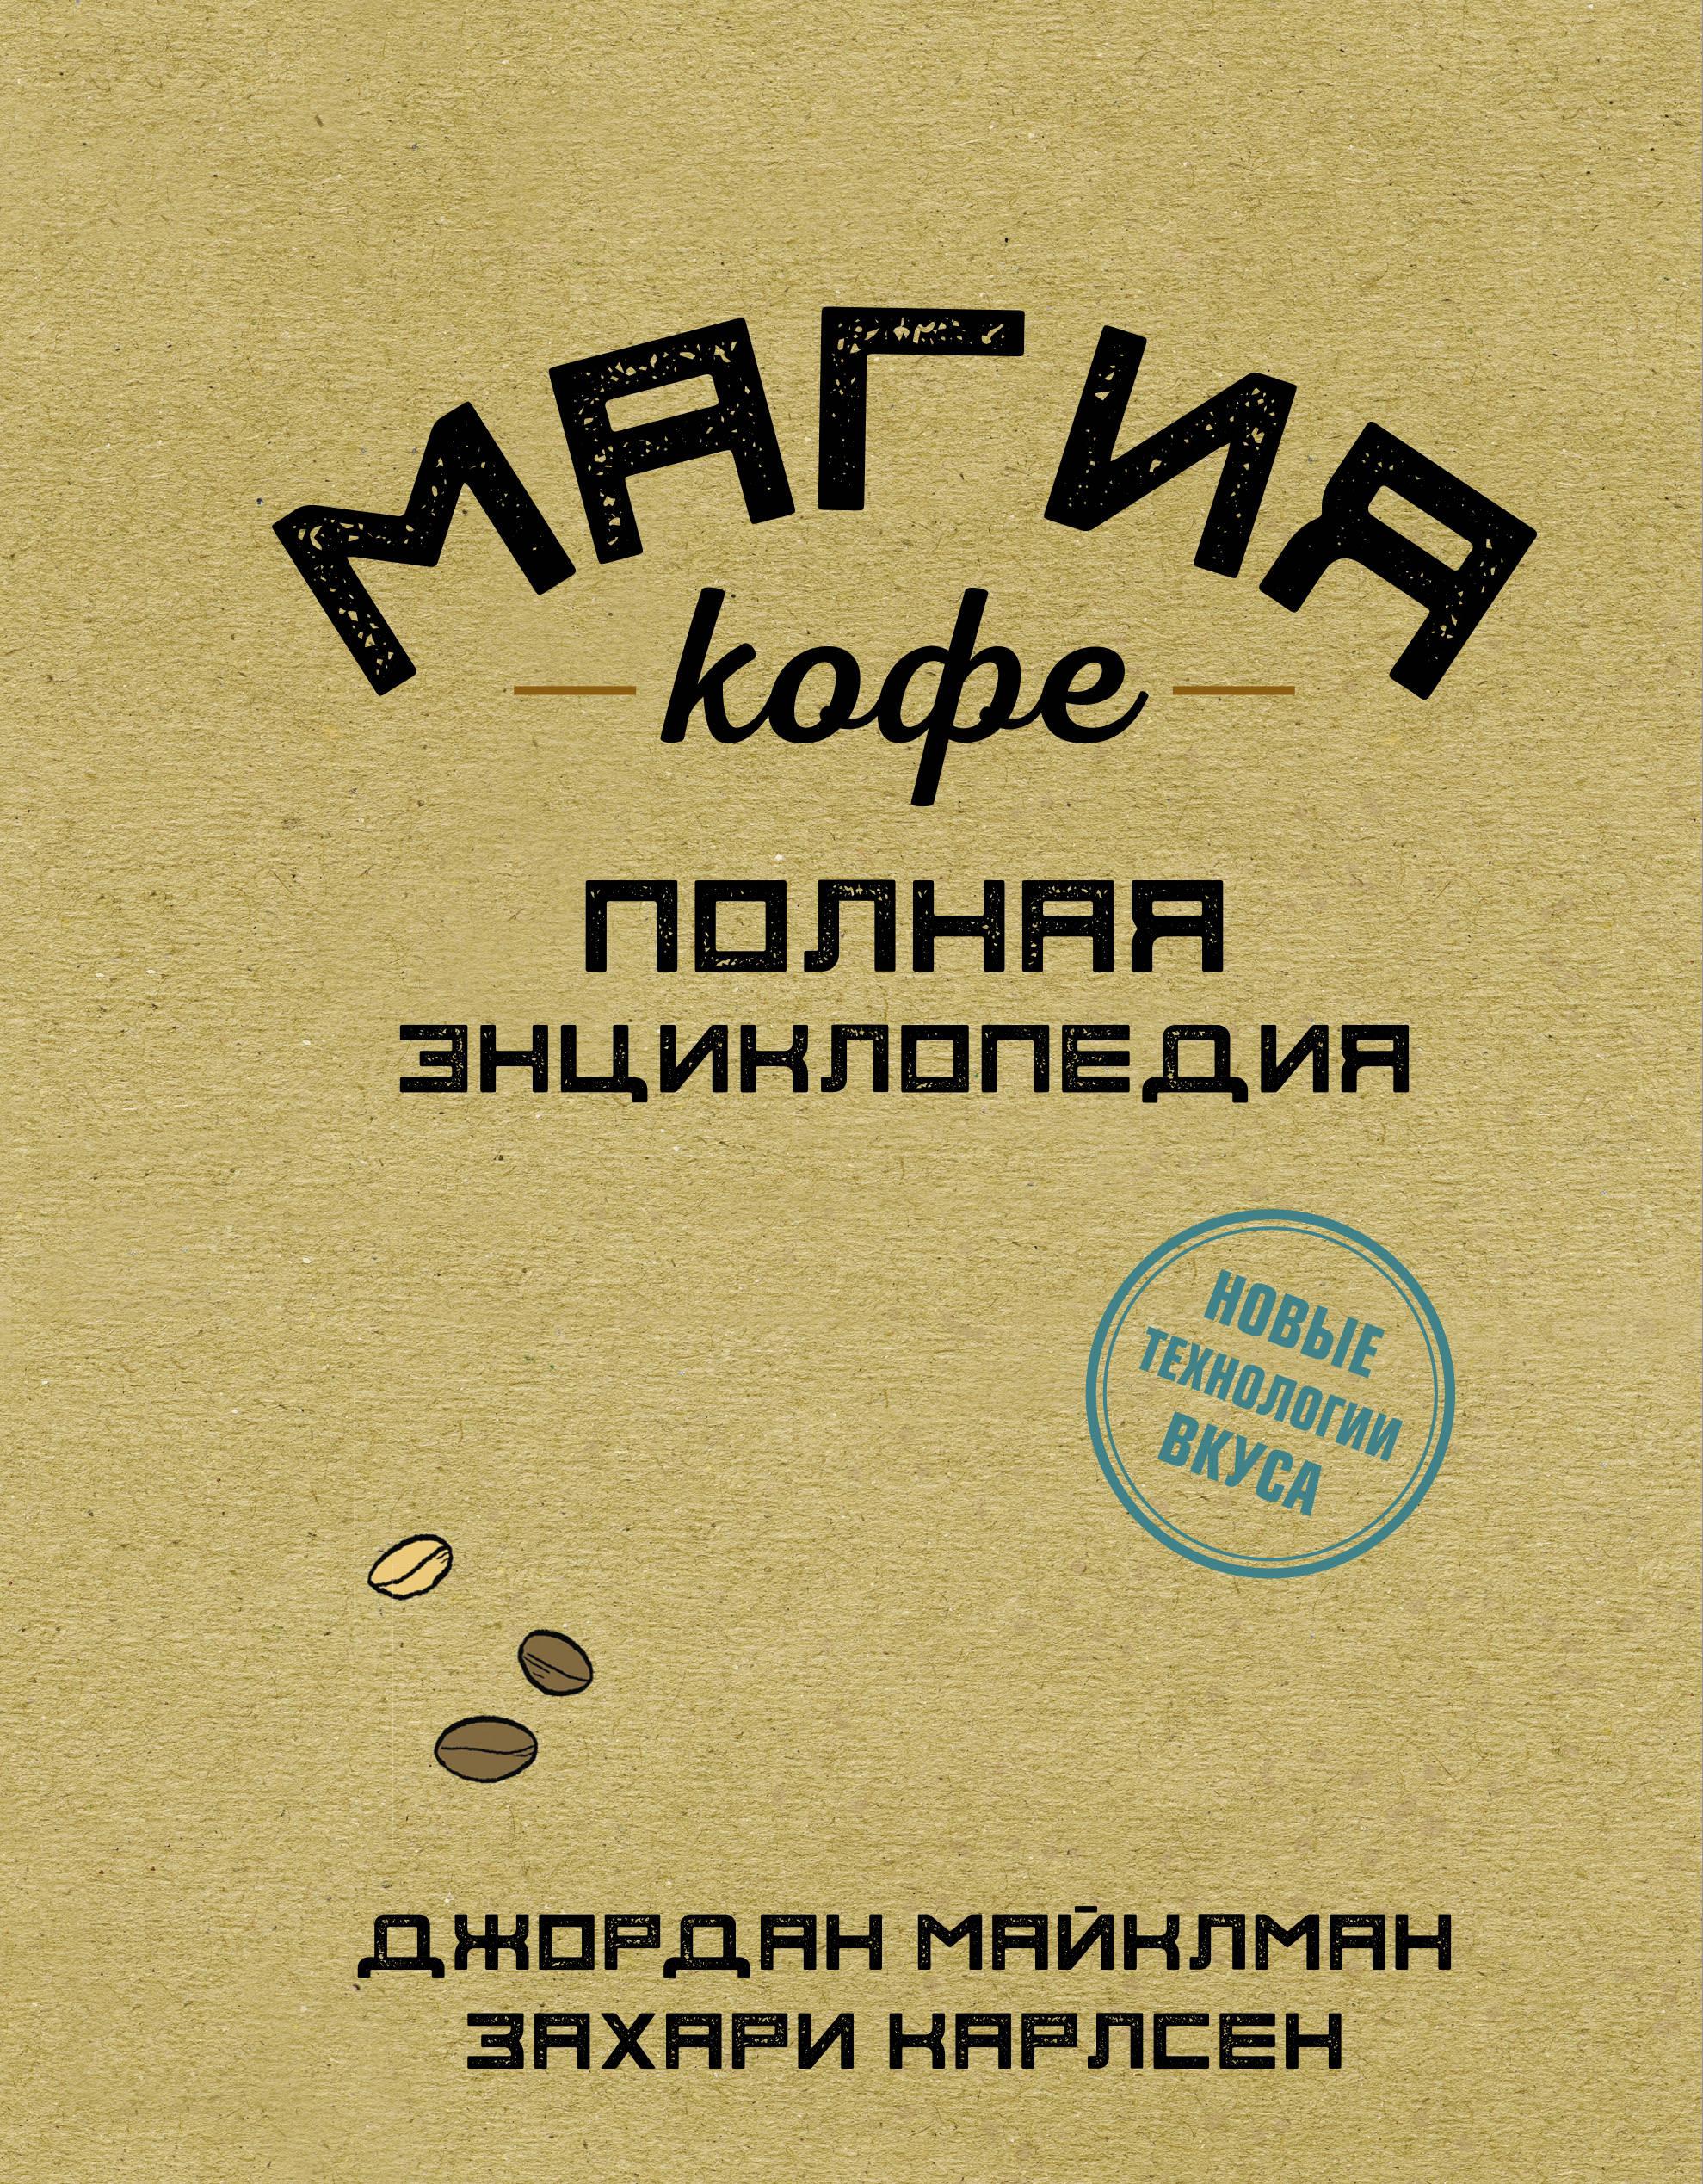 Магия кофе. Полная энциклопедия ( Майклман Джордан, Карлсен Захари  )